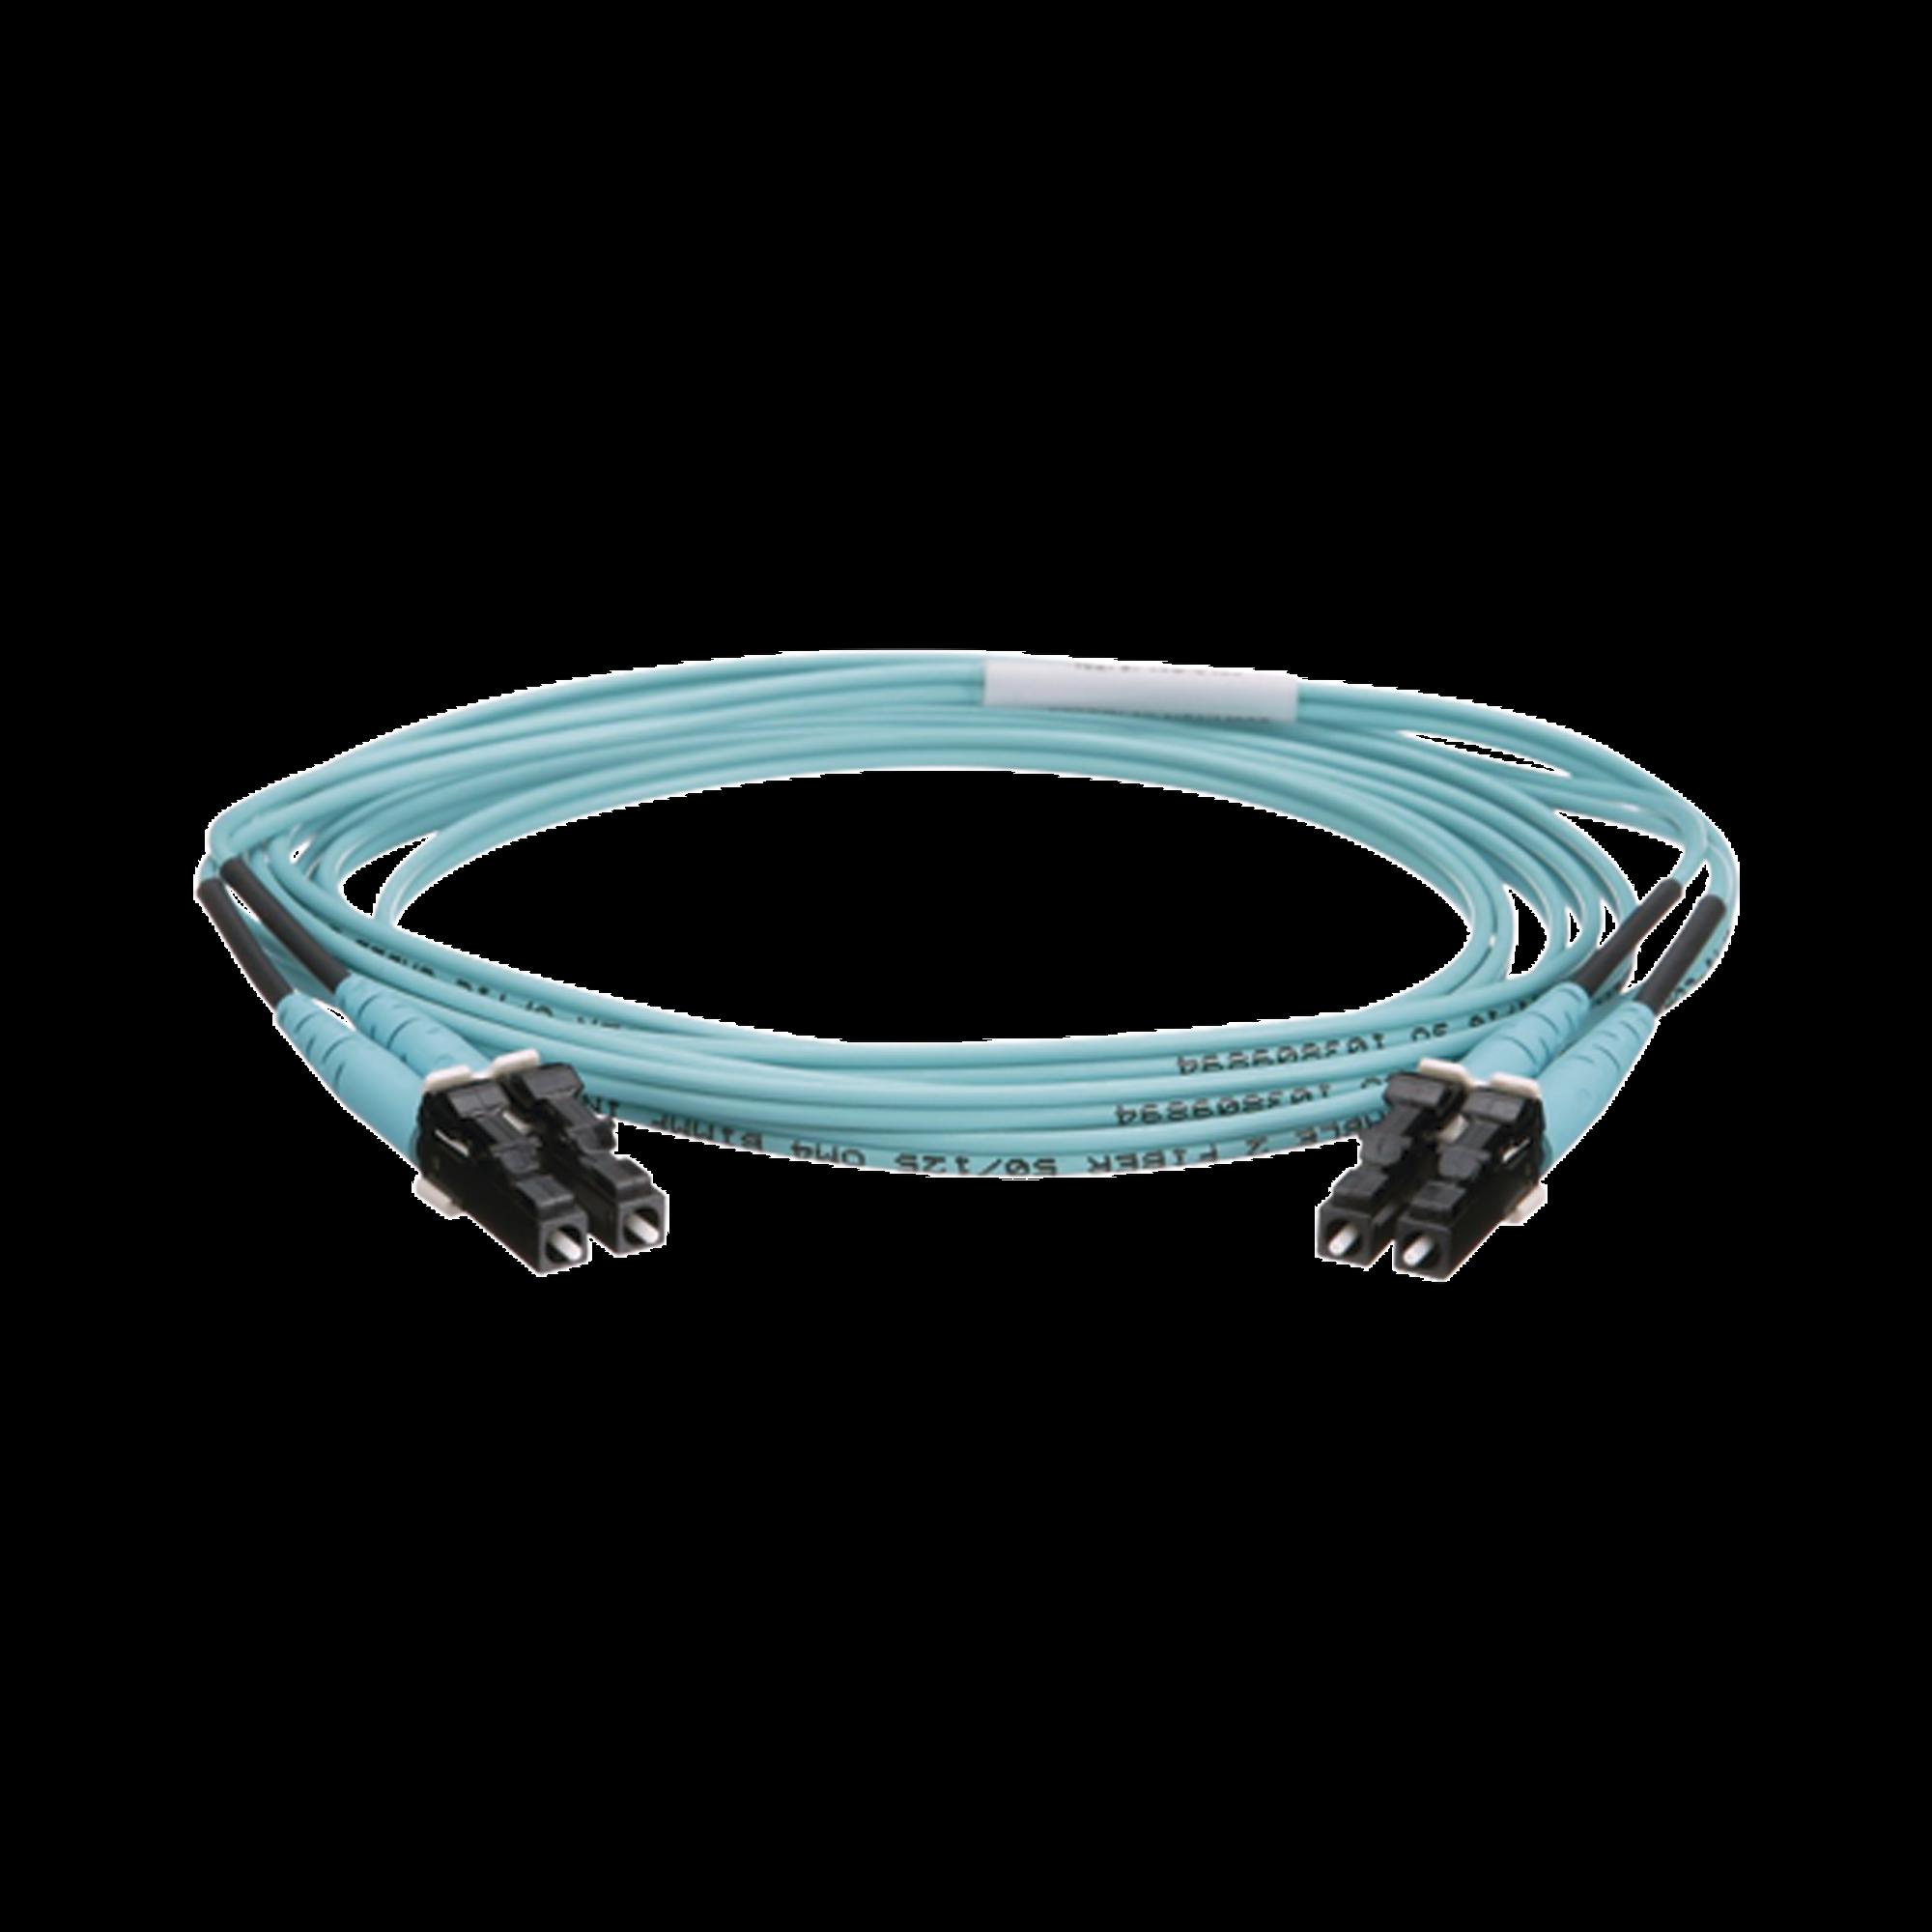 Jumper de Fibra Optica Multimodo 50/125 OM4, LC-LC Duplex, OFNR (Riser), Color Aqua, 2 Metros